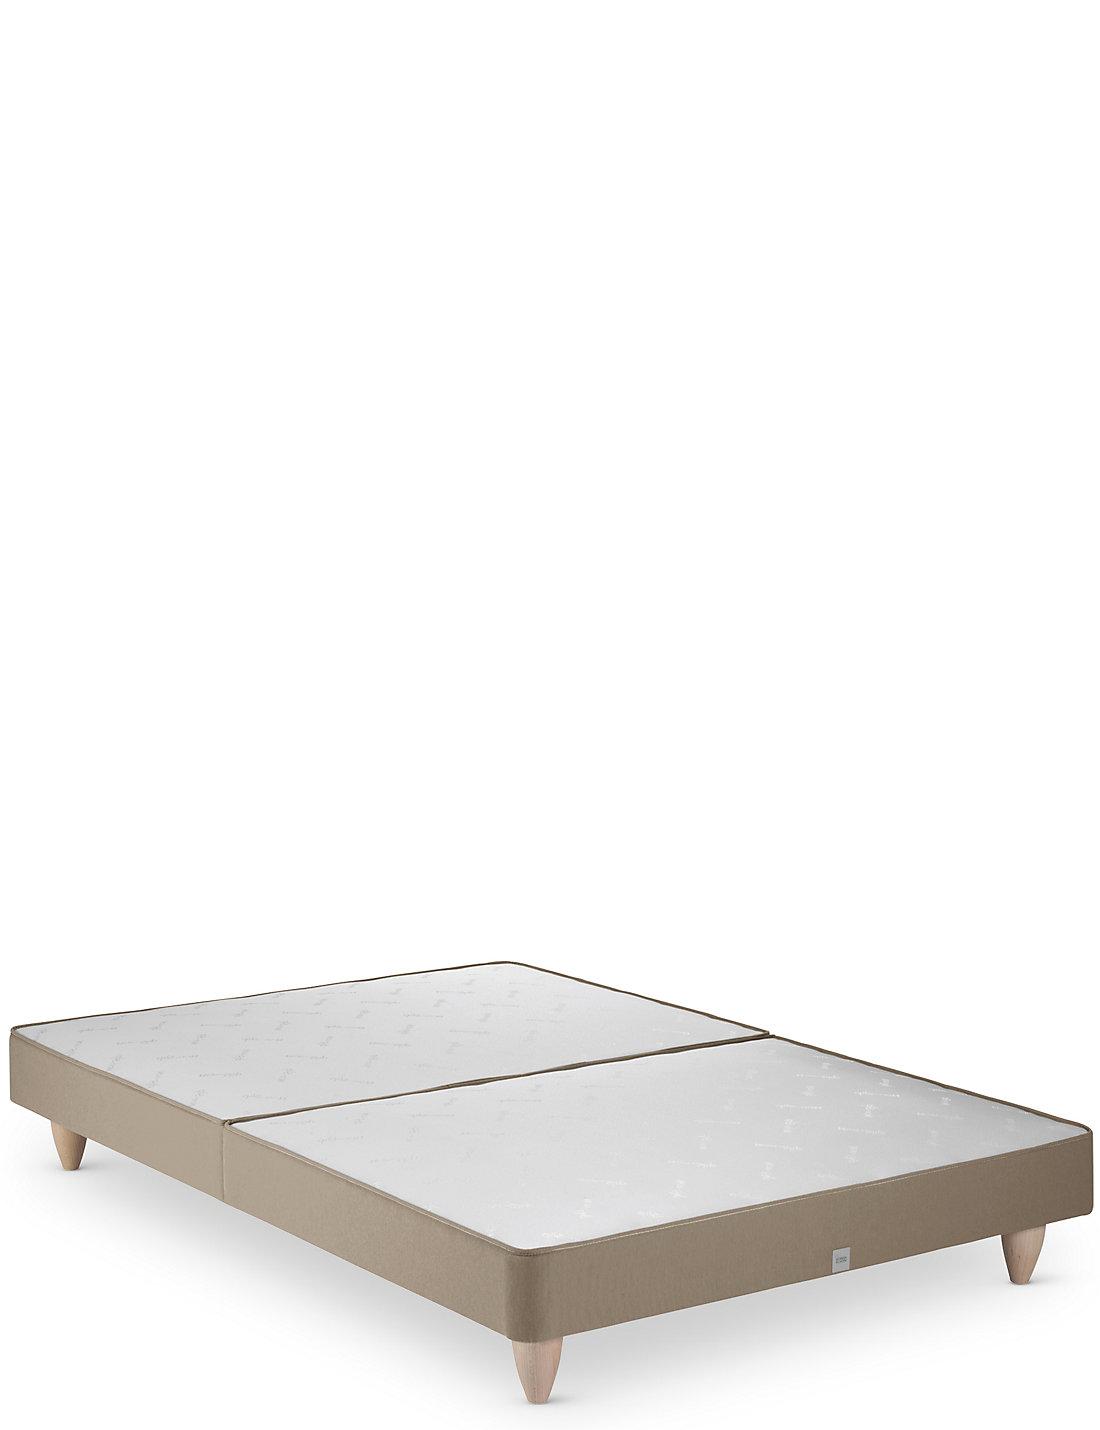 Divan bed base single grey fabric divan bed set memory for Sprung base divan bed with storage